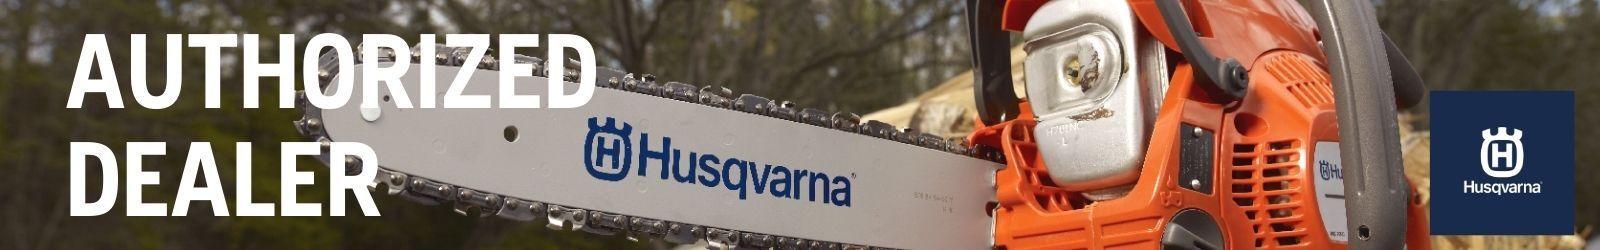 Husqvarna Authorized Dealer